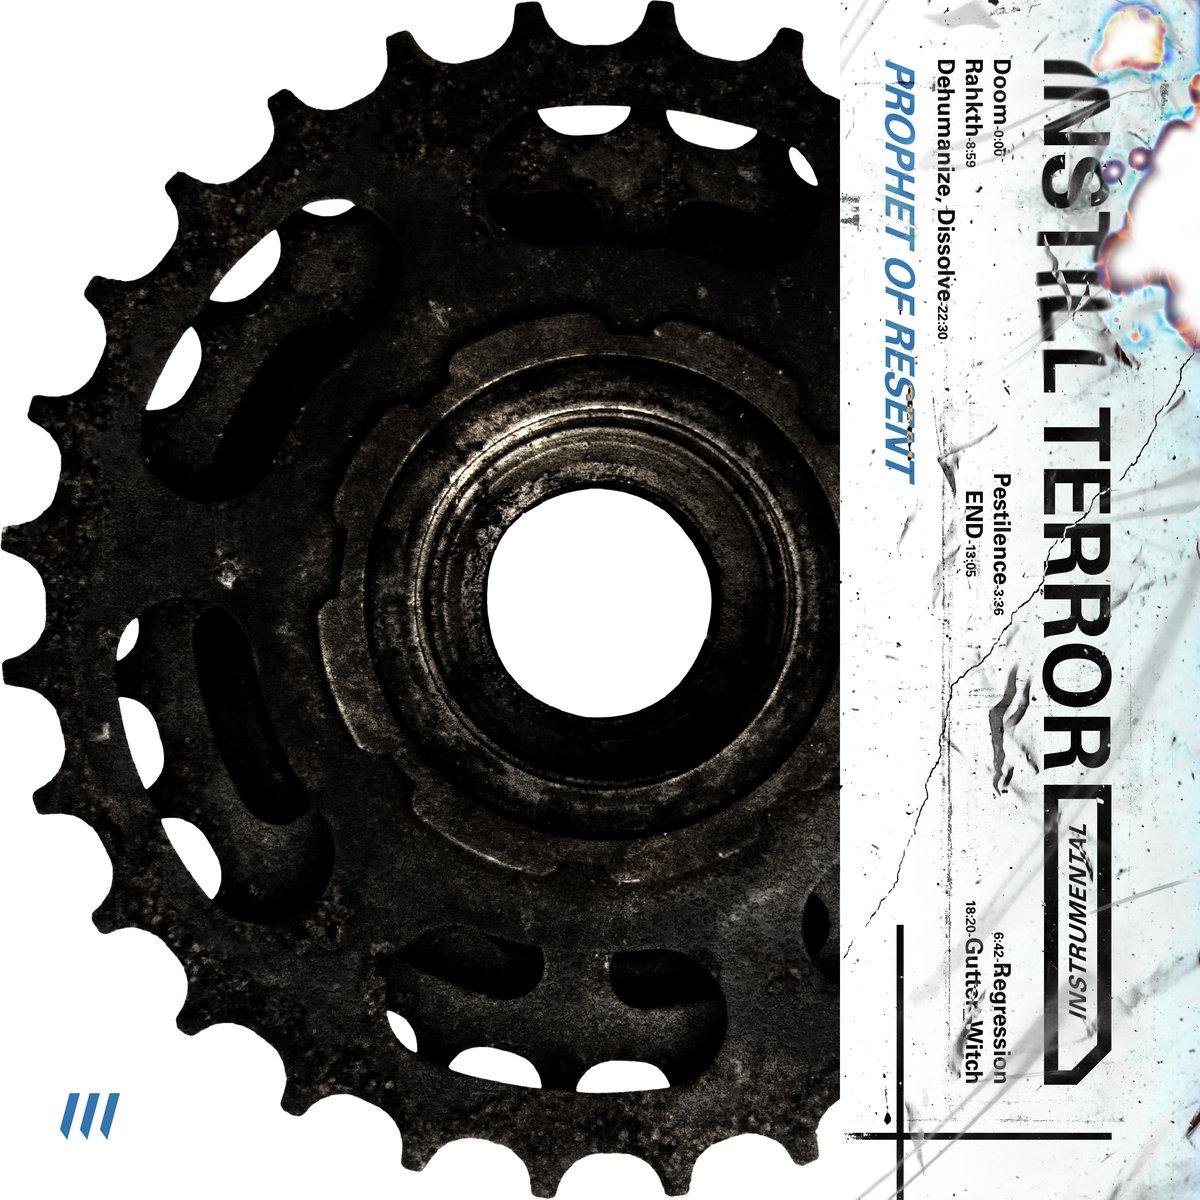 INSTILL TERROR - Prophet of Resent (Instrumental) [EP] (2019)